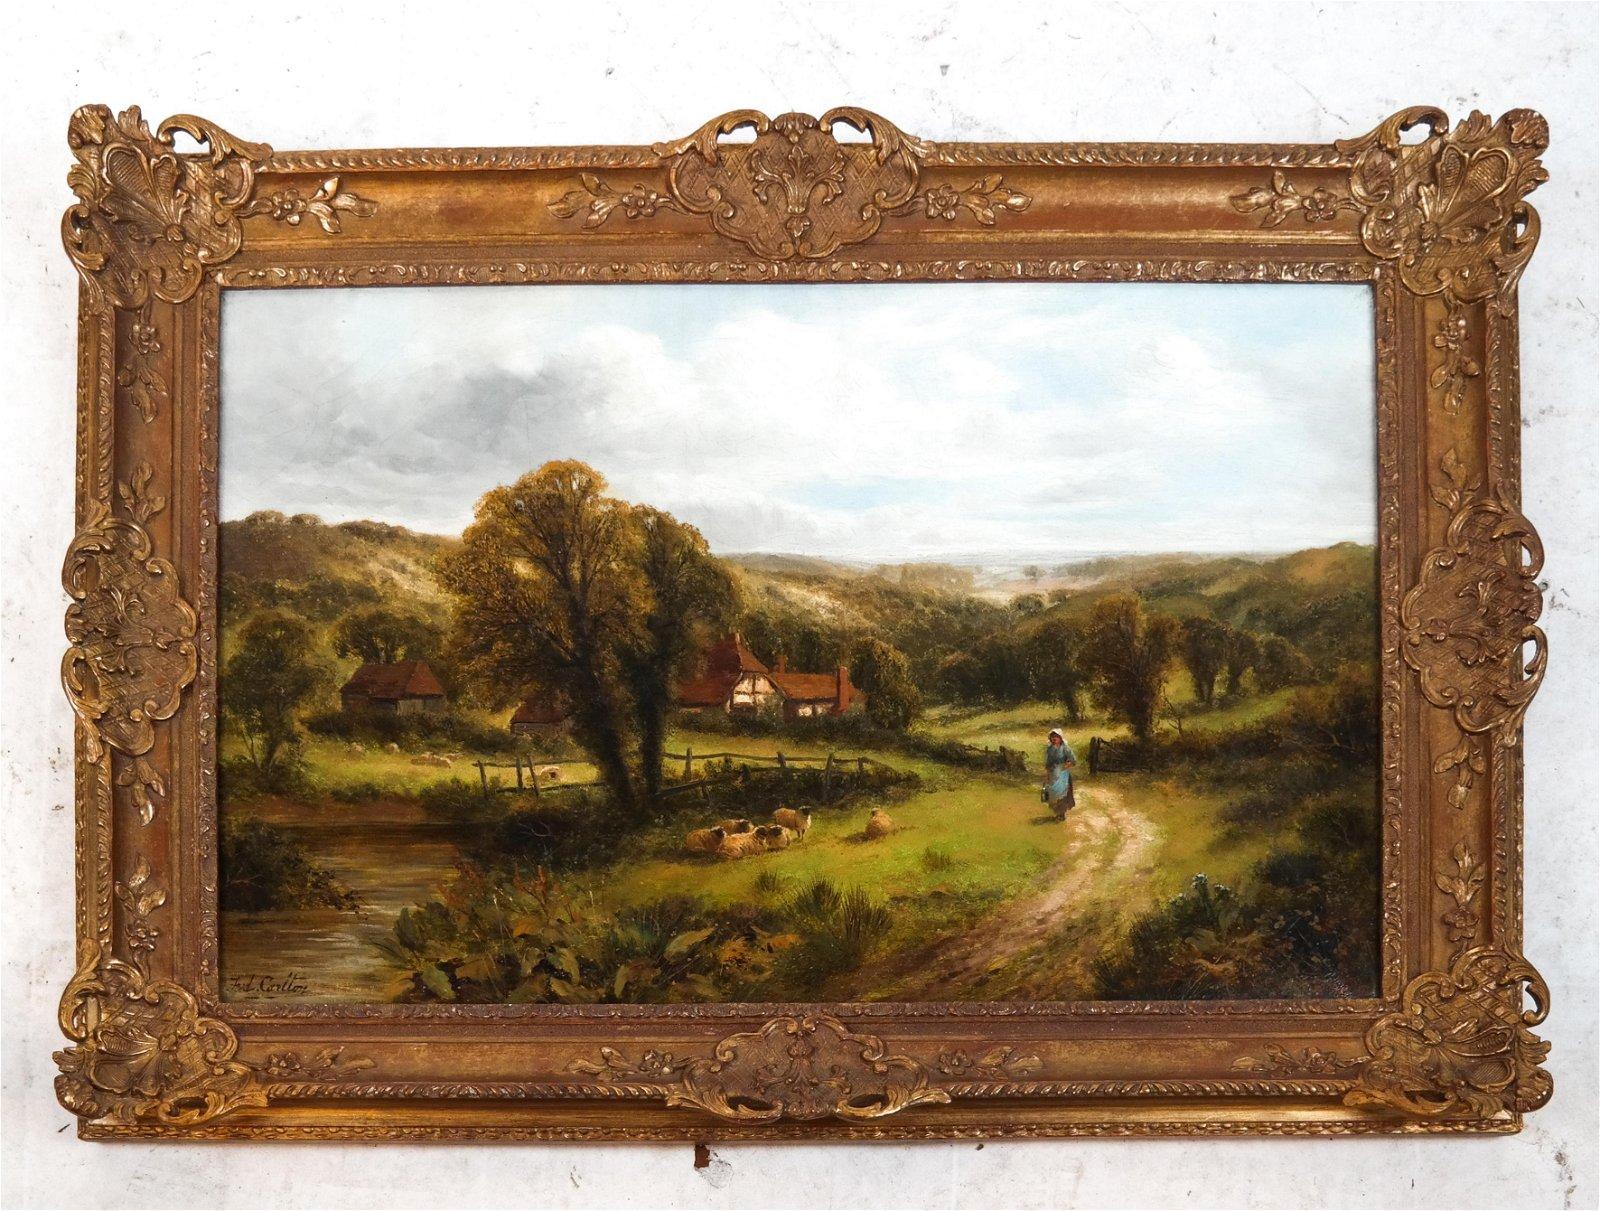 Fred CARLTON: Pastoral Landscape - Oil on Canvas